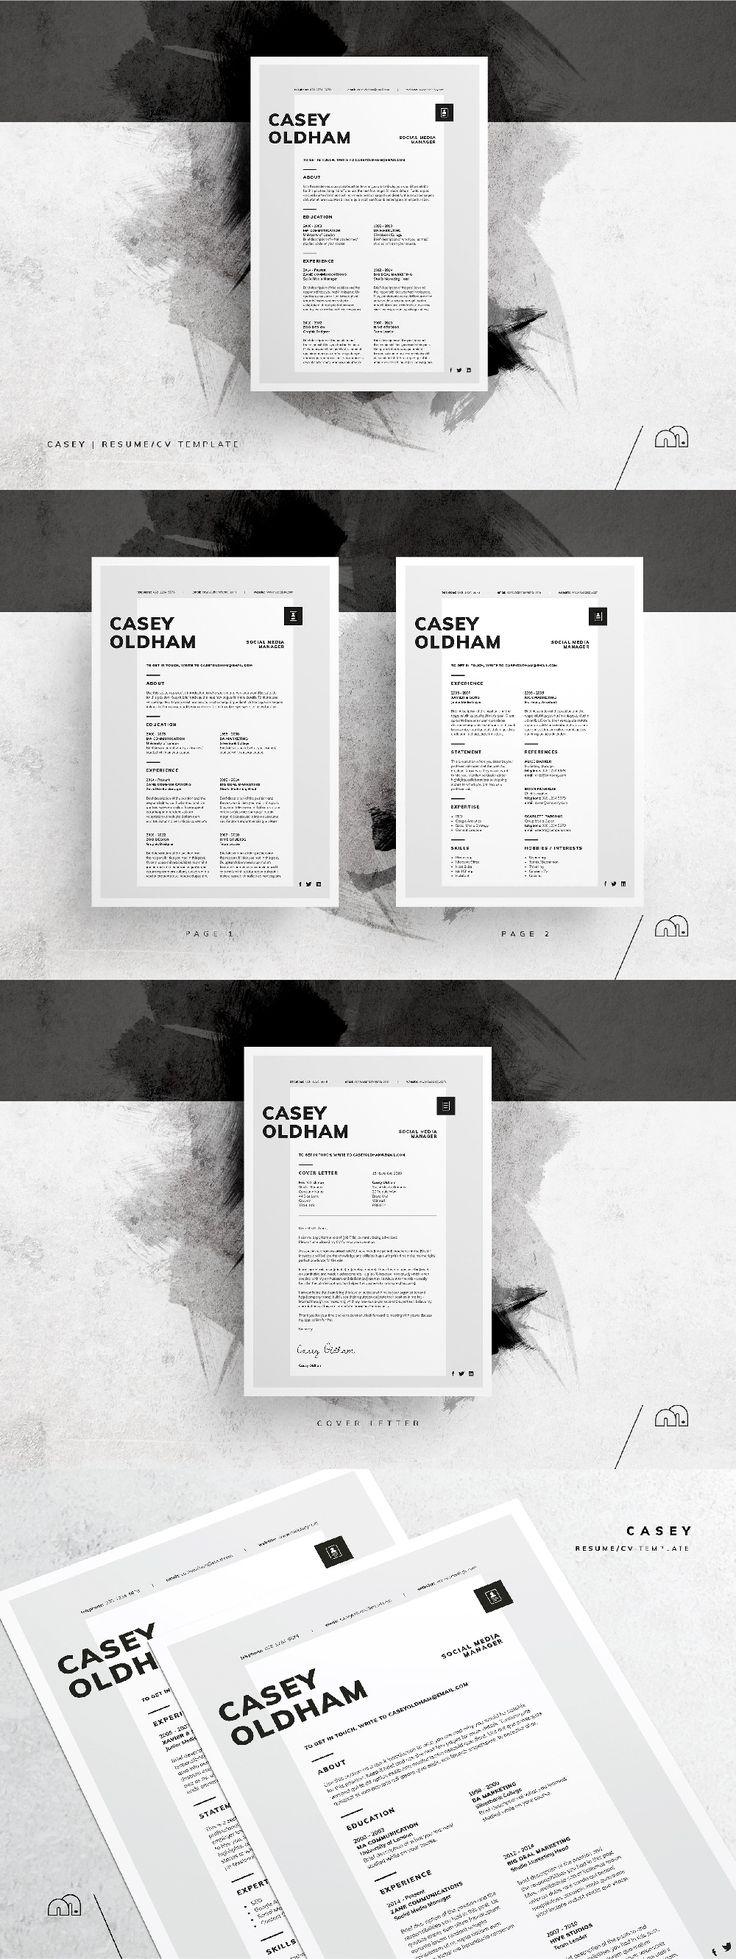 Excellent Filetype Docx Curriculum Vitae Pictures Inspiration